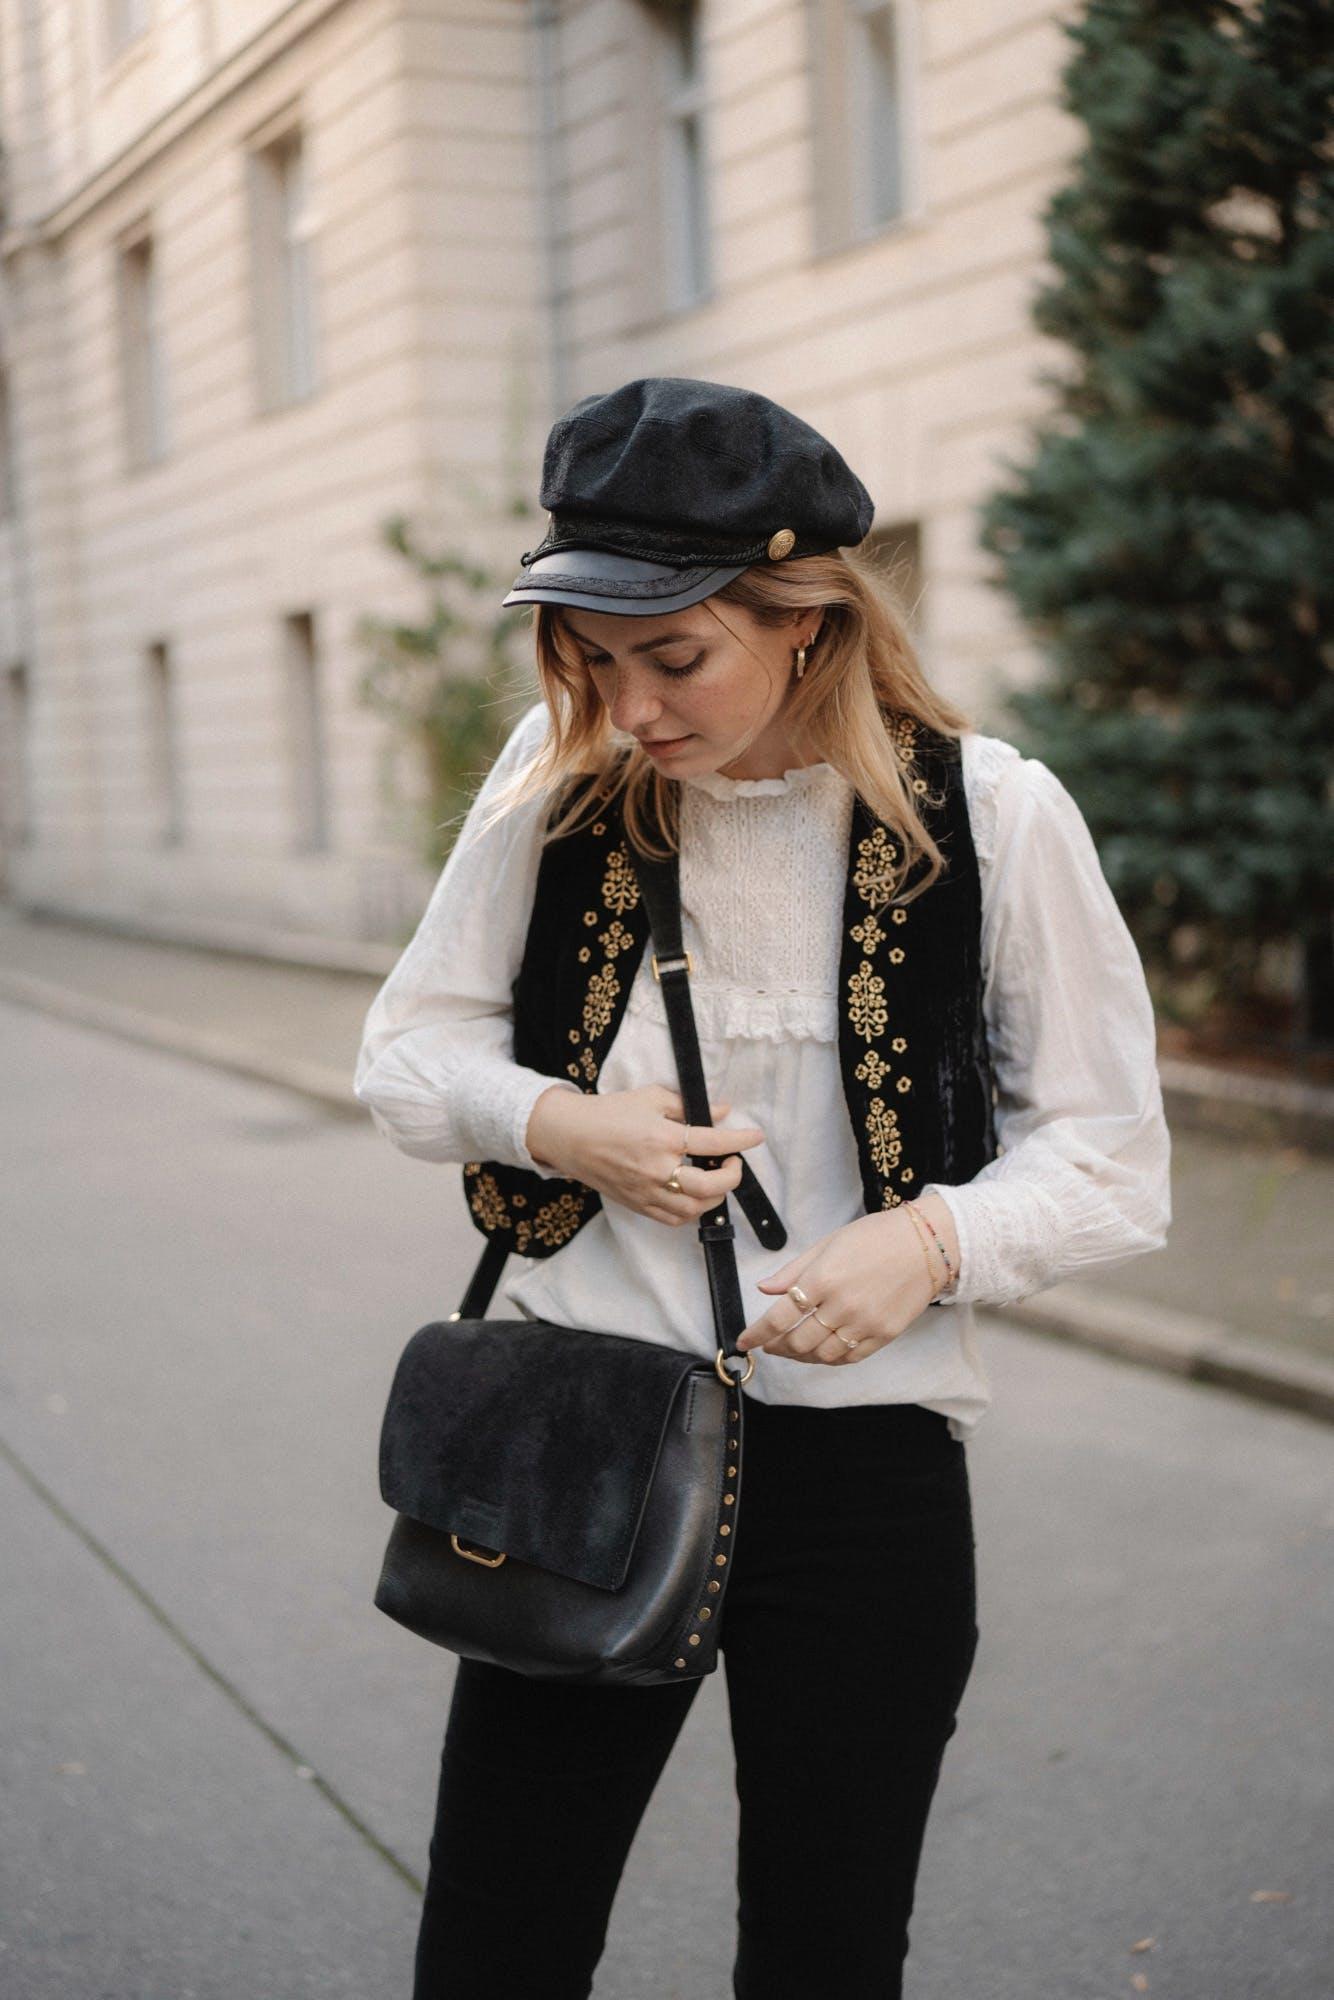 Die perfekte Everyday Bag – 5 Handtaschen, in die alles passt!